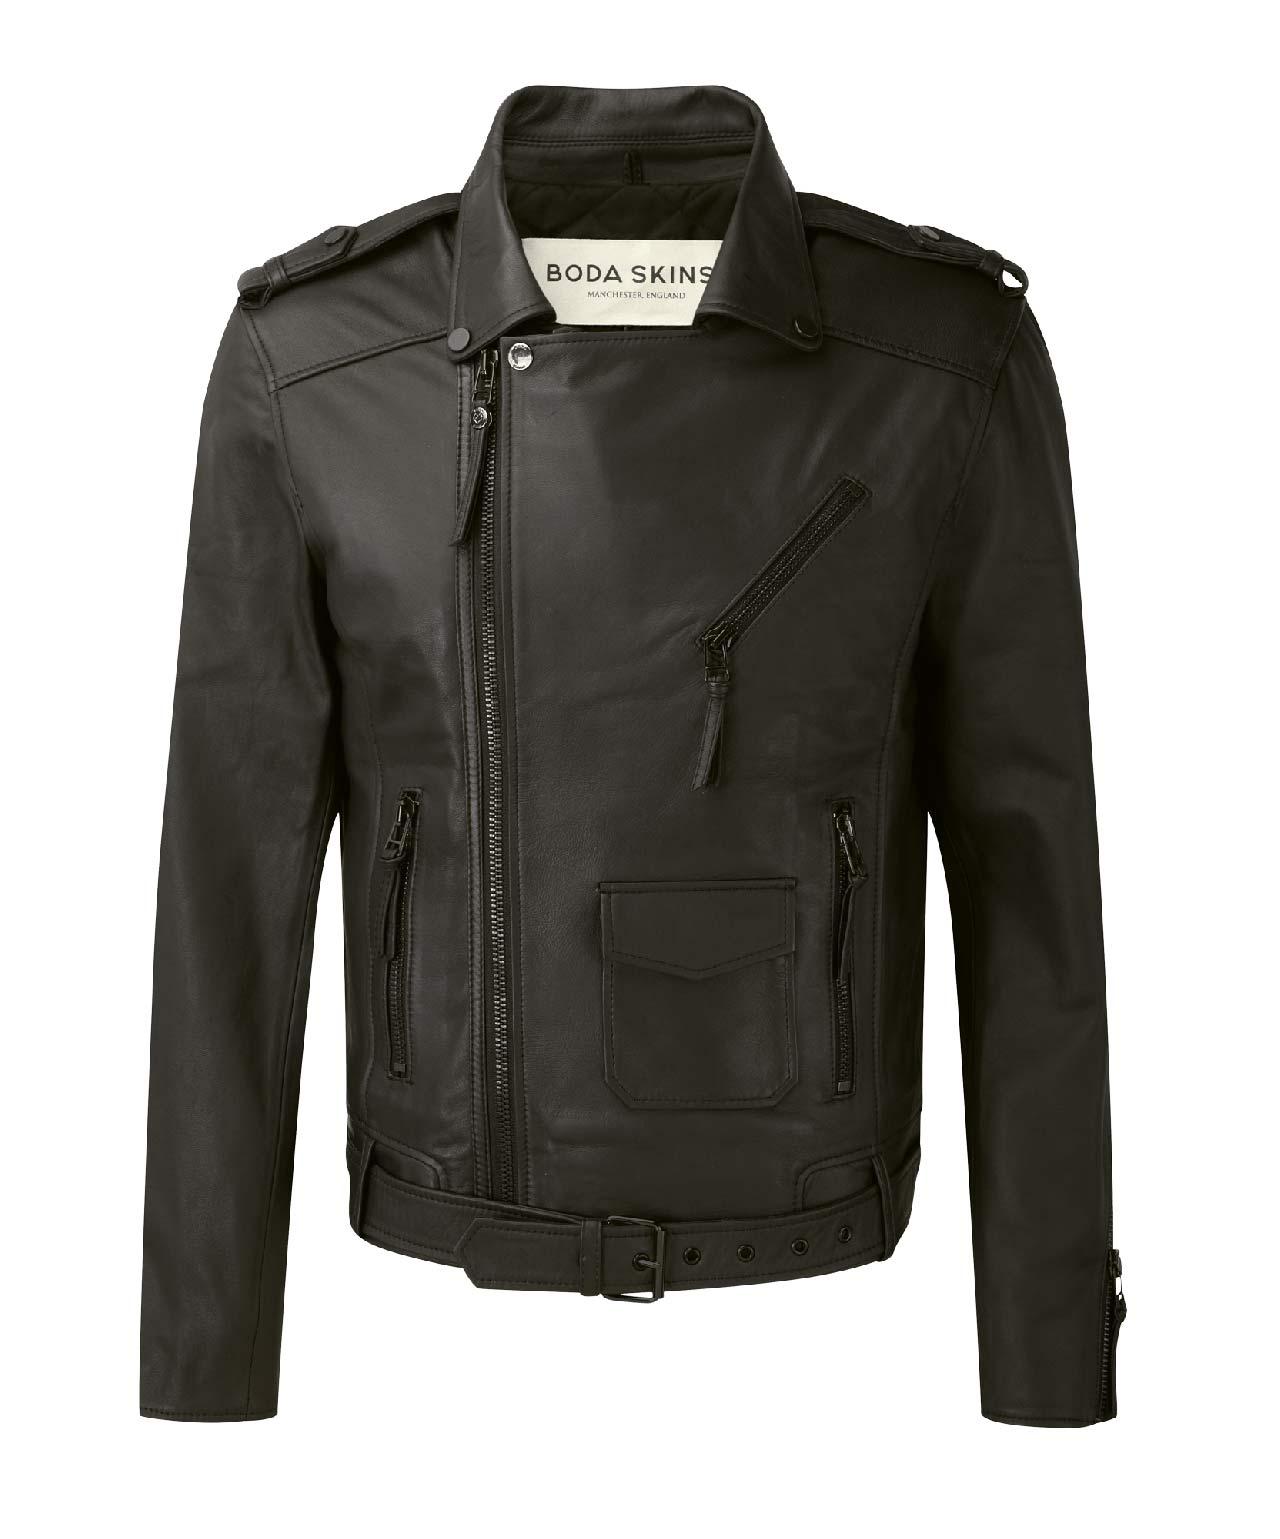 boda-skins-classic-biker-black-zipped_2